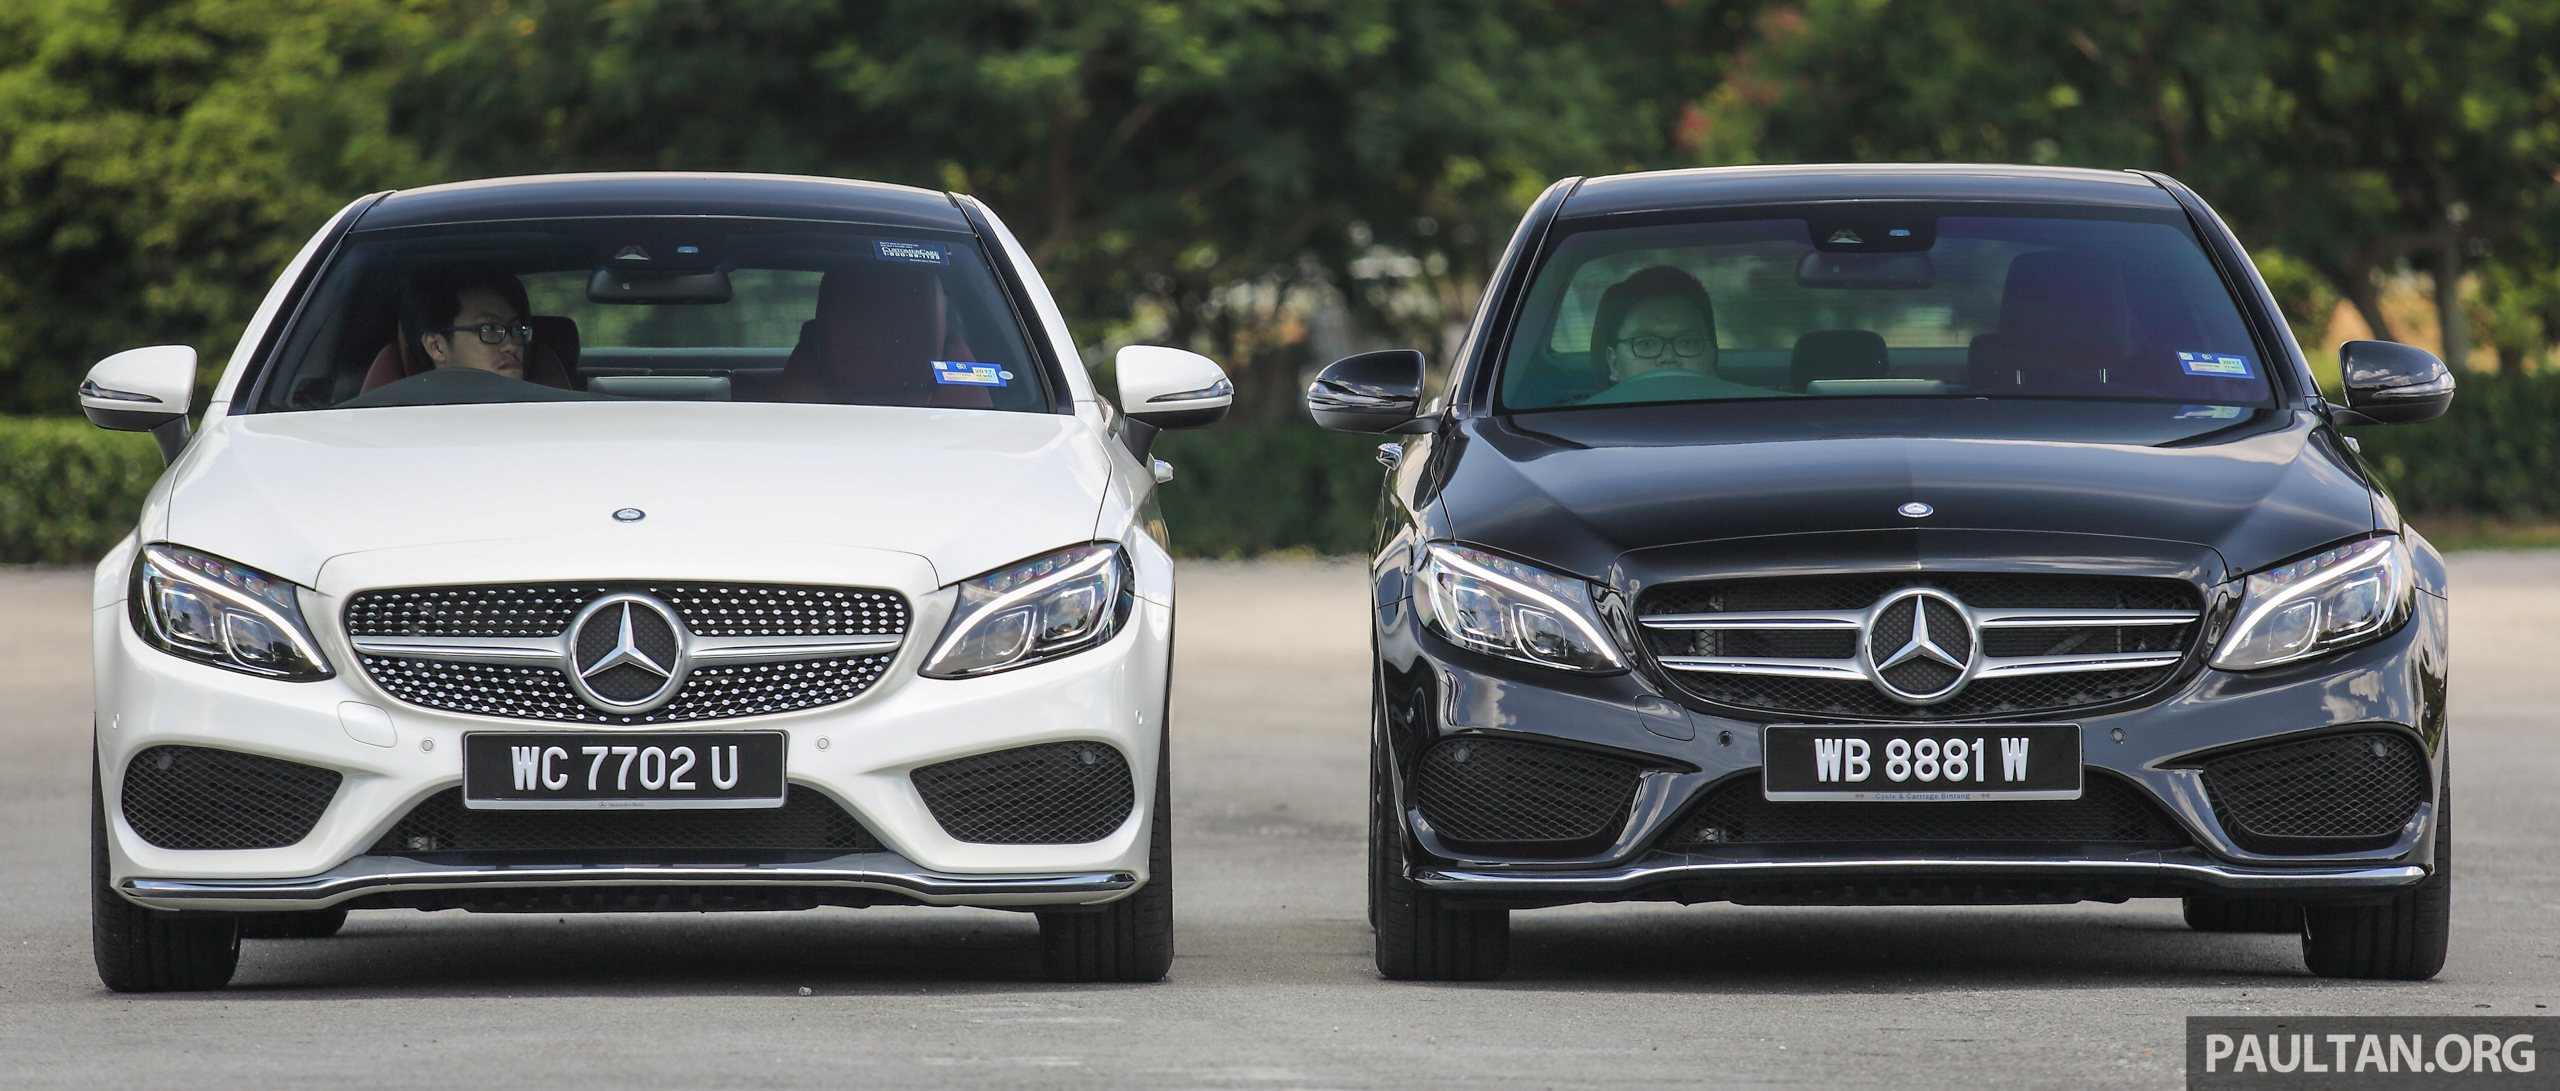 Gallery Mercedes Benz Coupe Vs Sedan Image